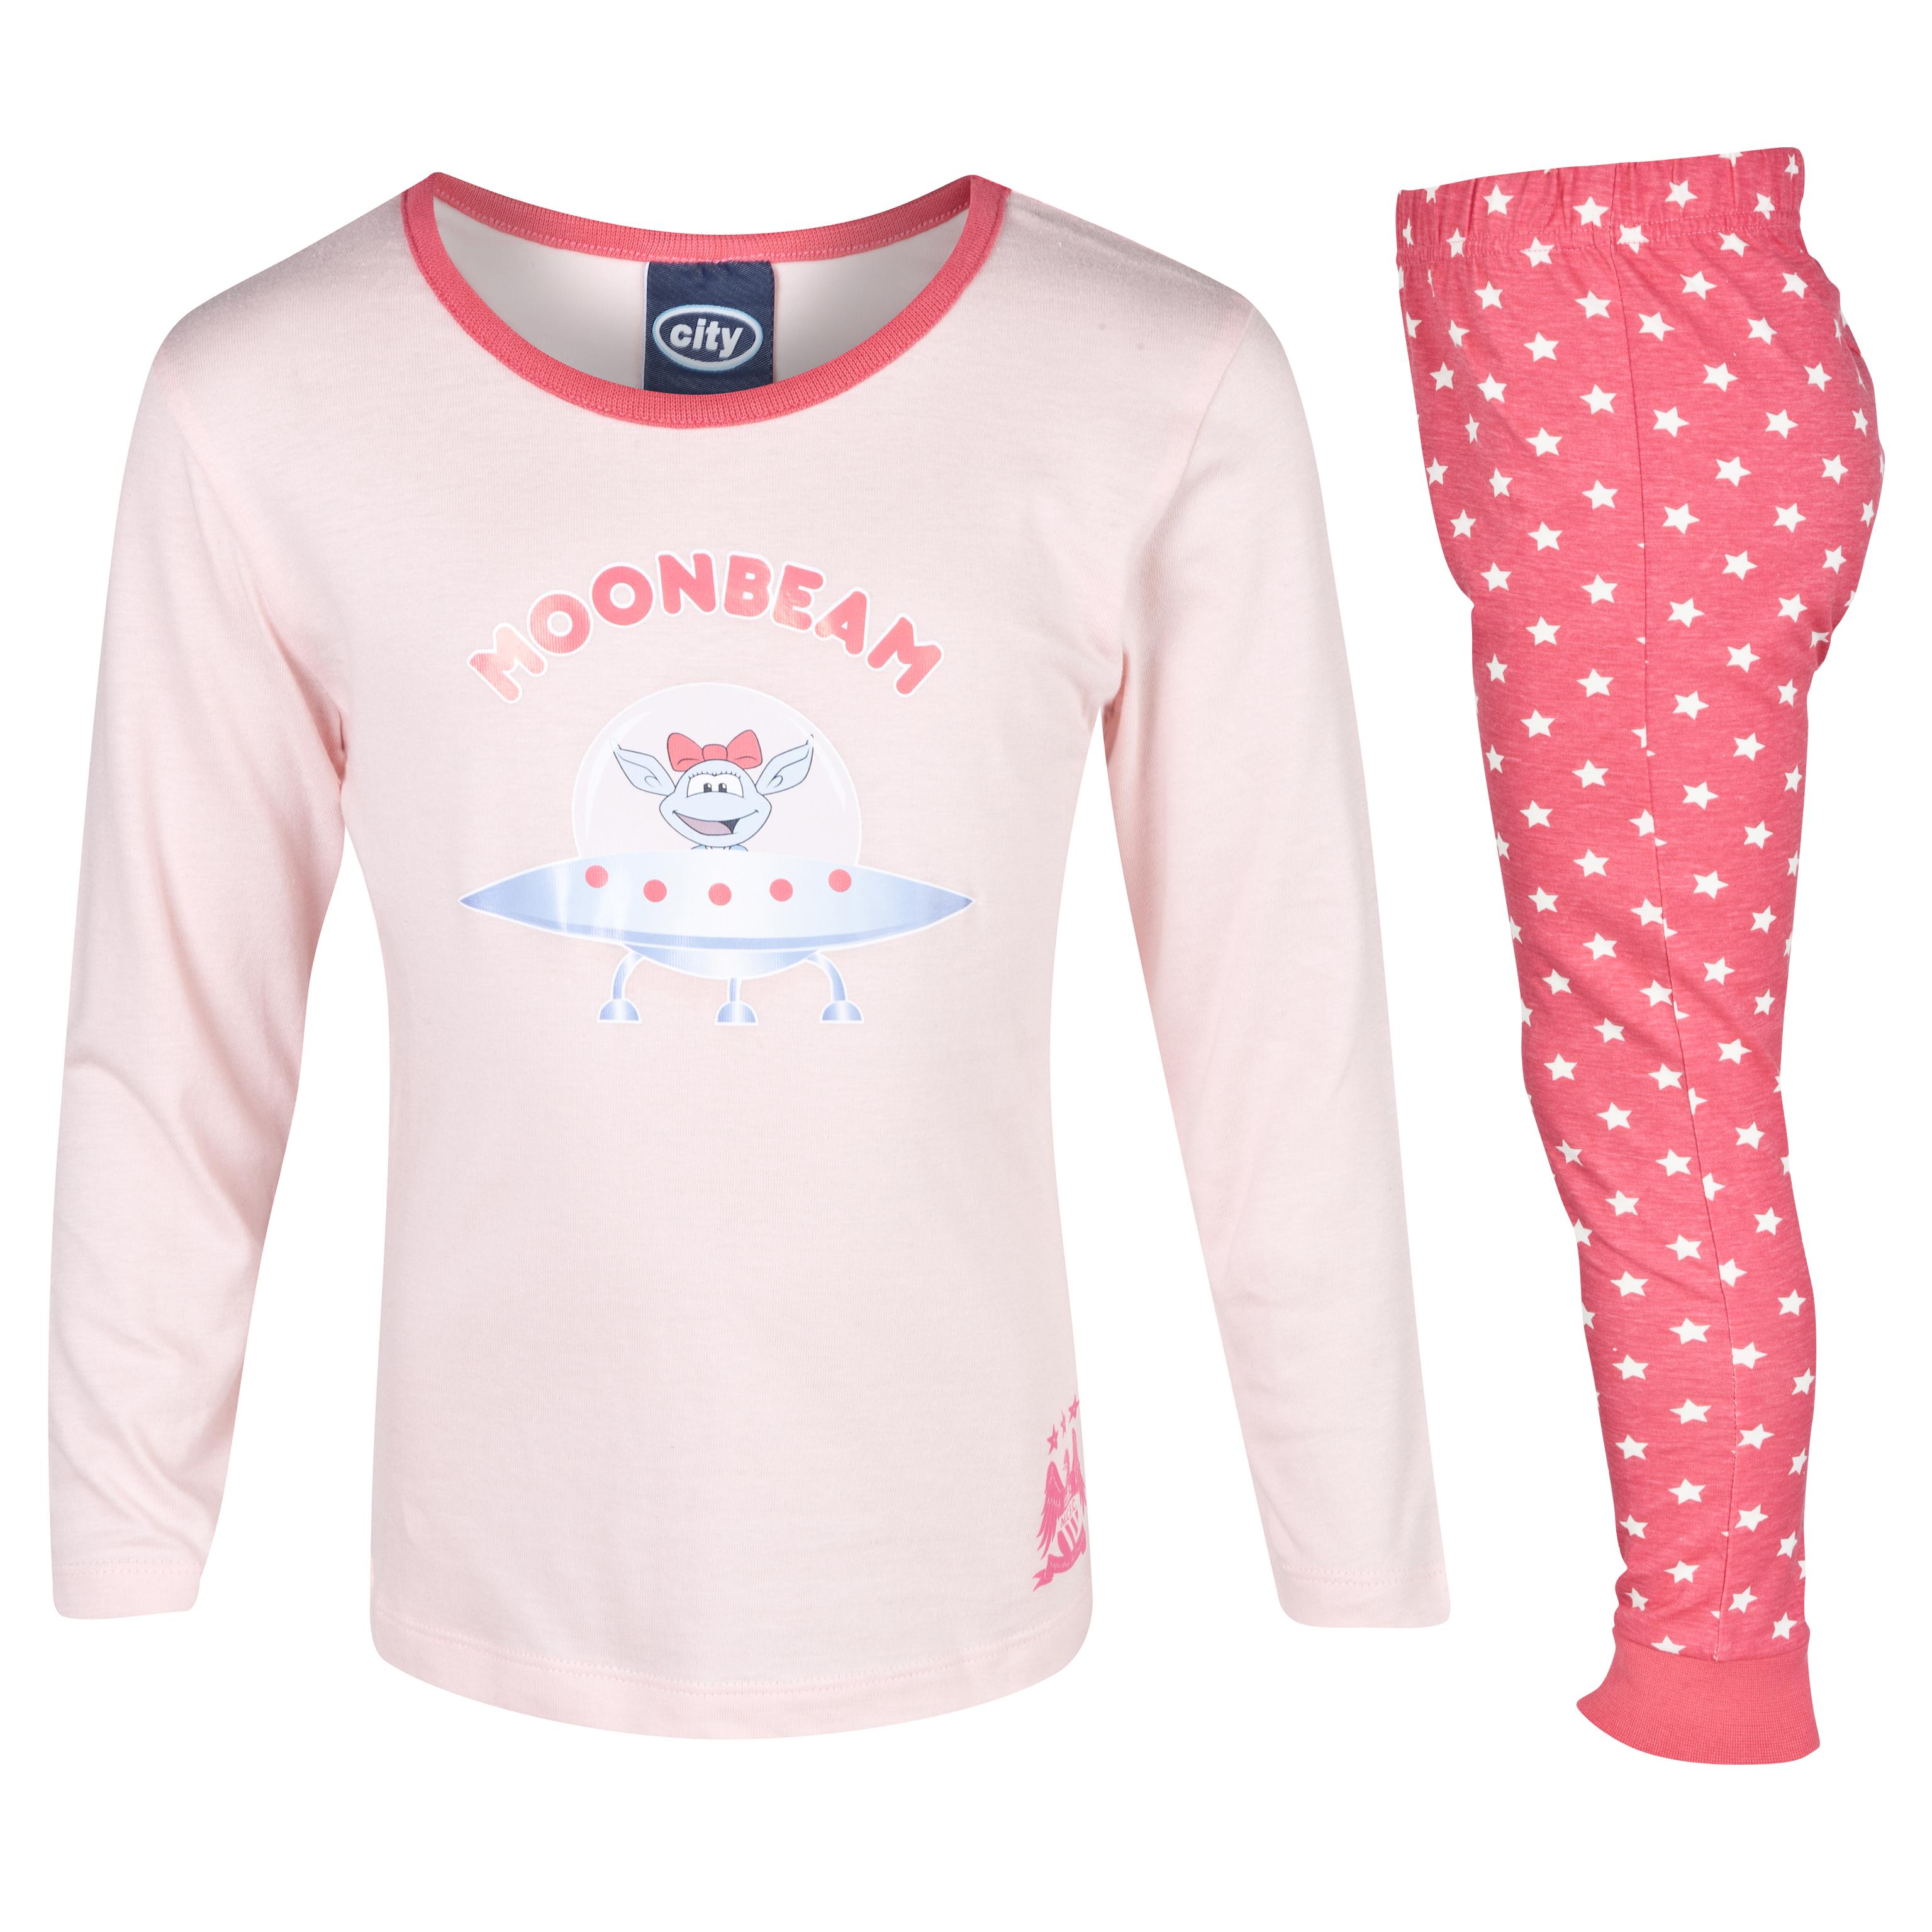 Manchester City Moonbeam Pyjamas Infant Girls Pink